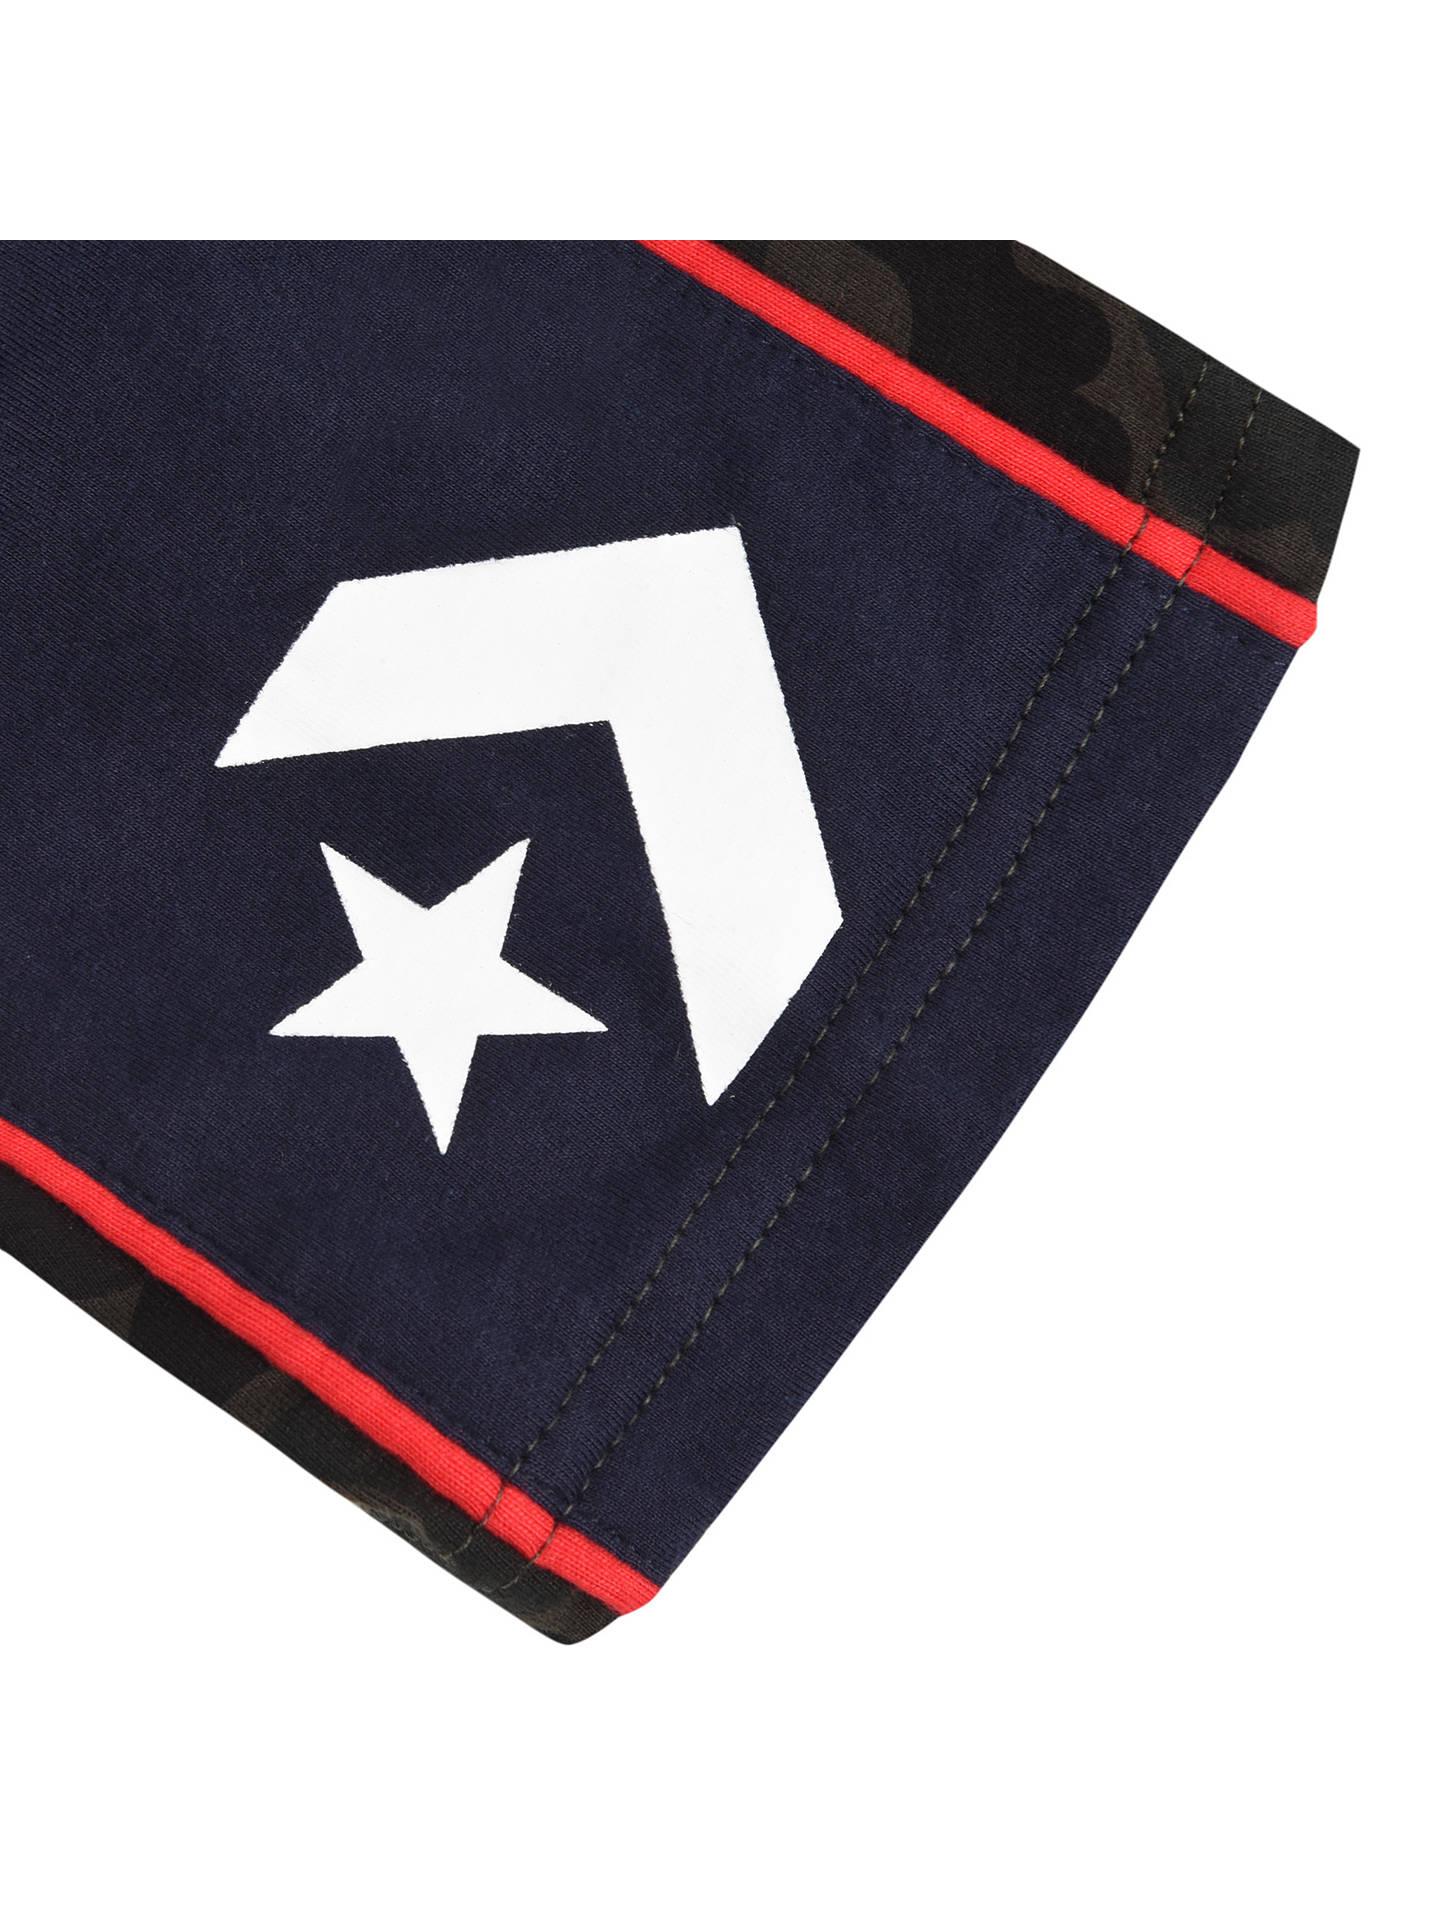 Ralph Lauren Patchwork Camo Canvas Backpack- Fenix Toulouse Handball 69e1d68f09736